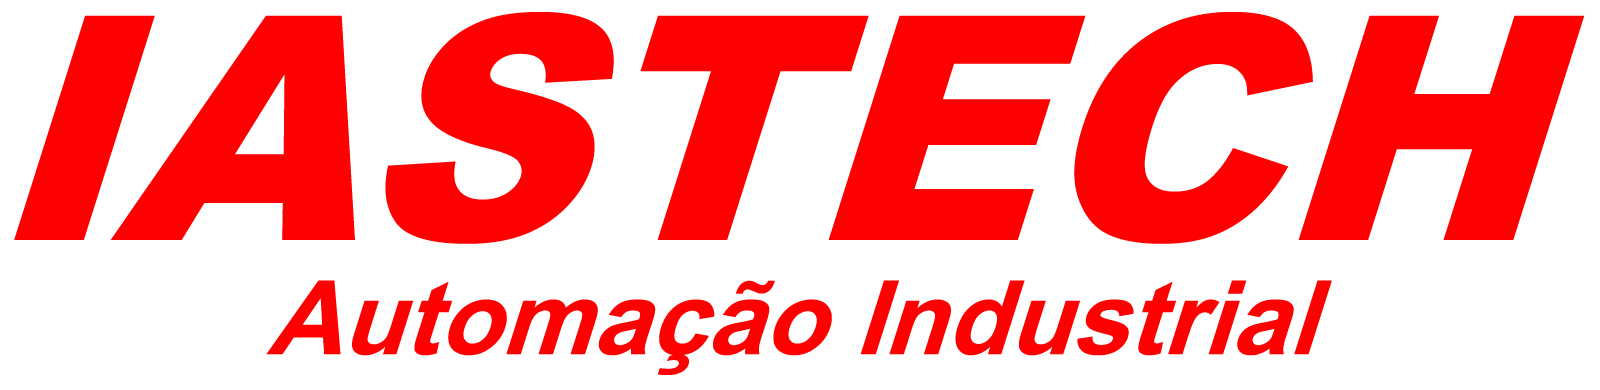 iastech automacaoindustrial